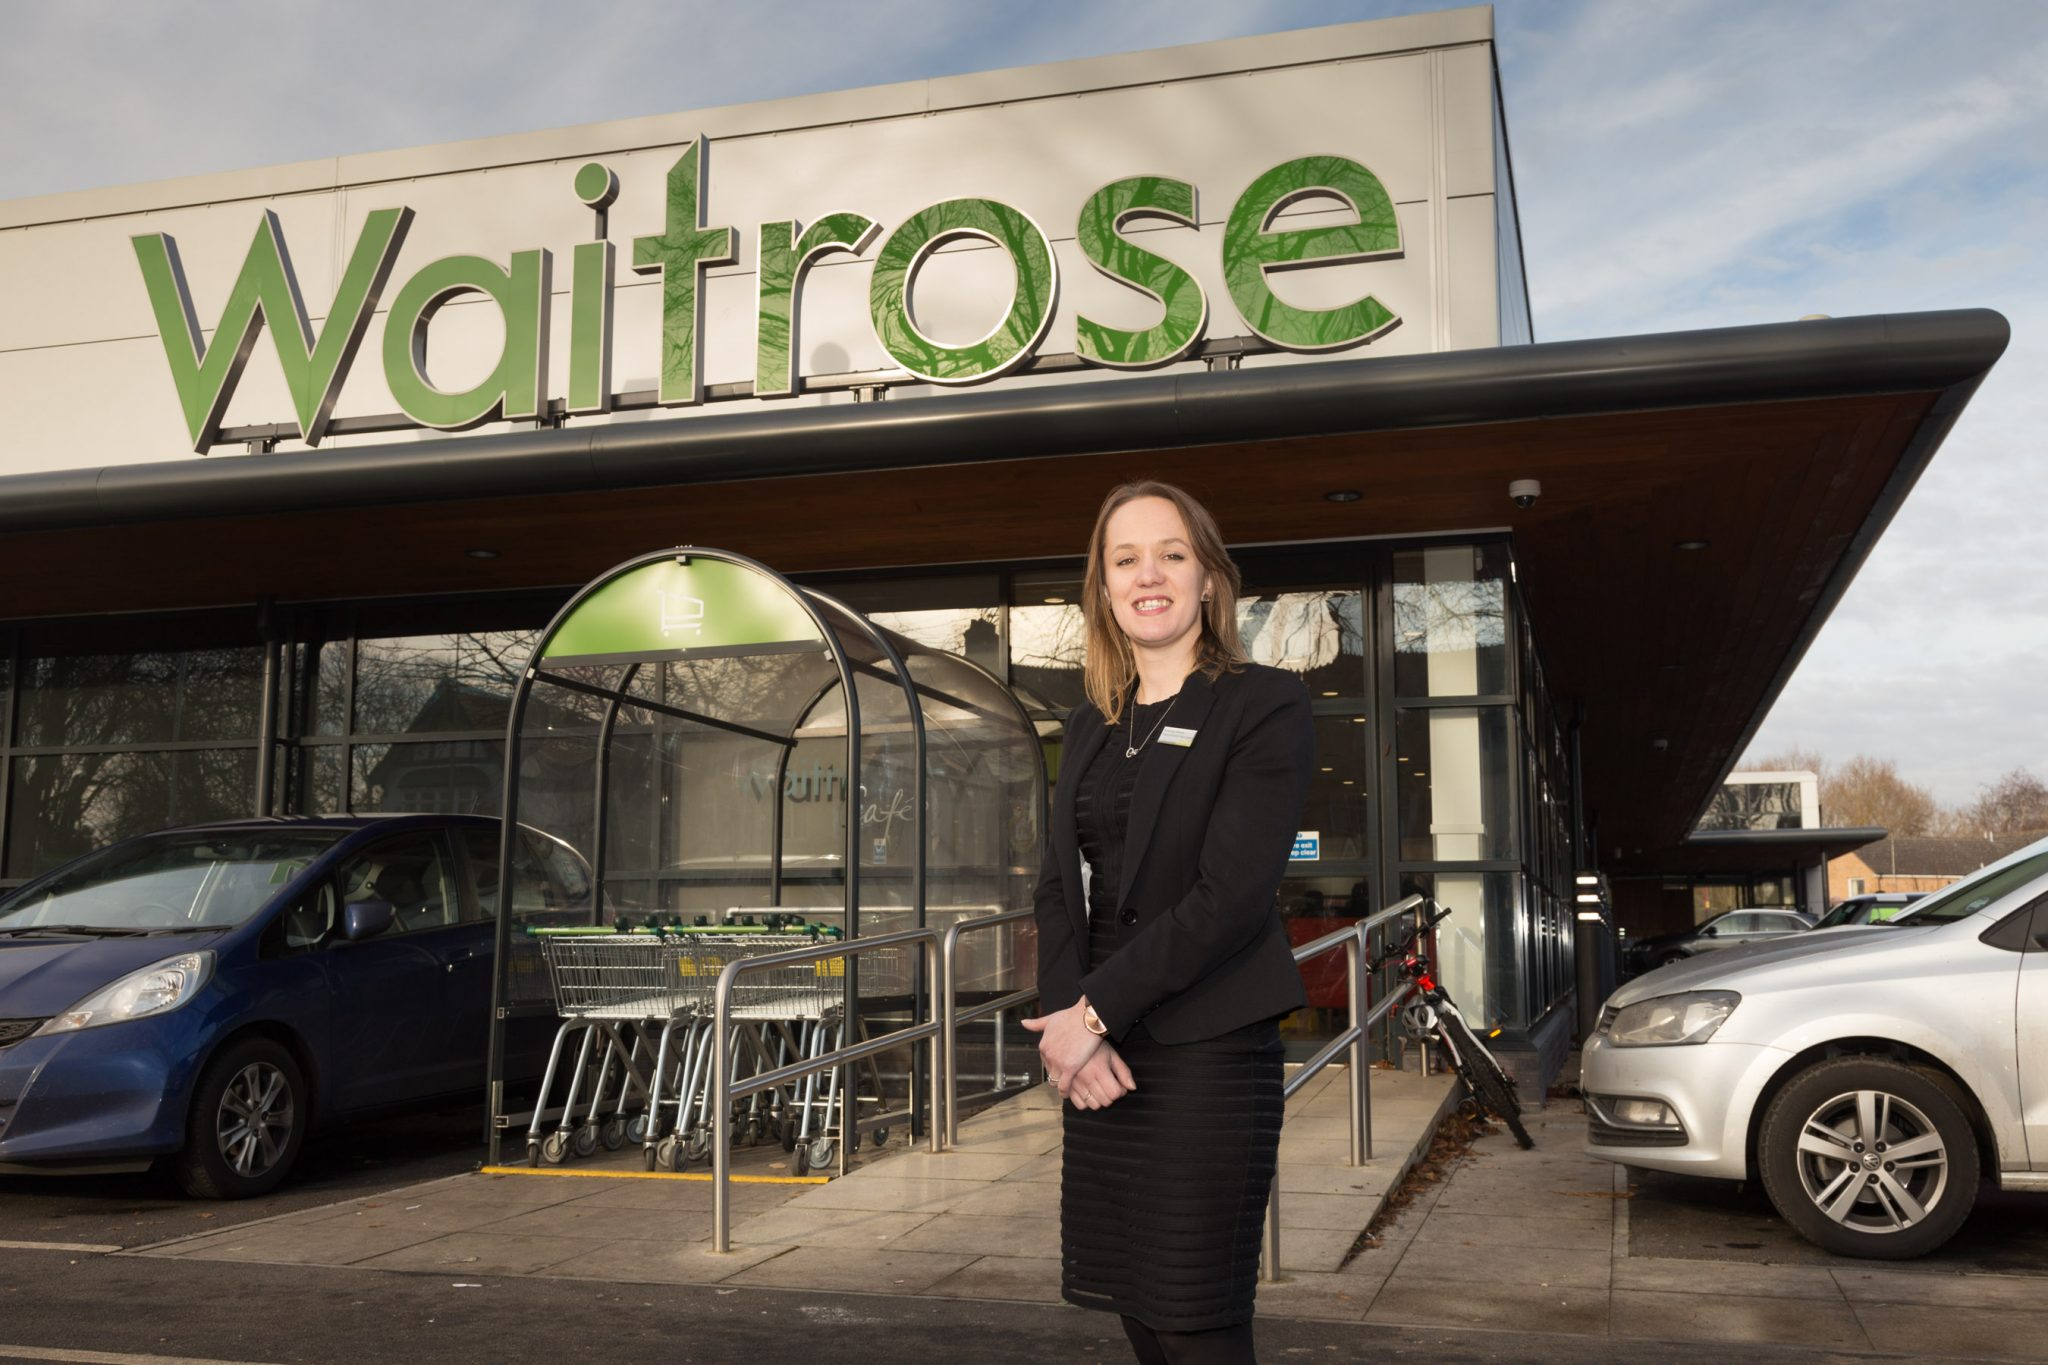 Waitrose Manager portrait photo